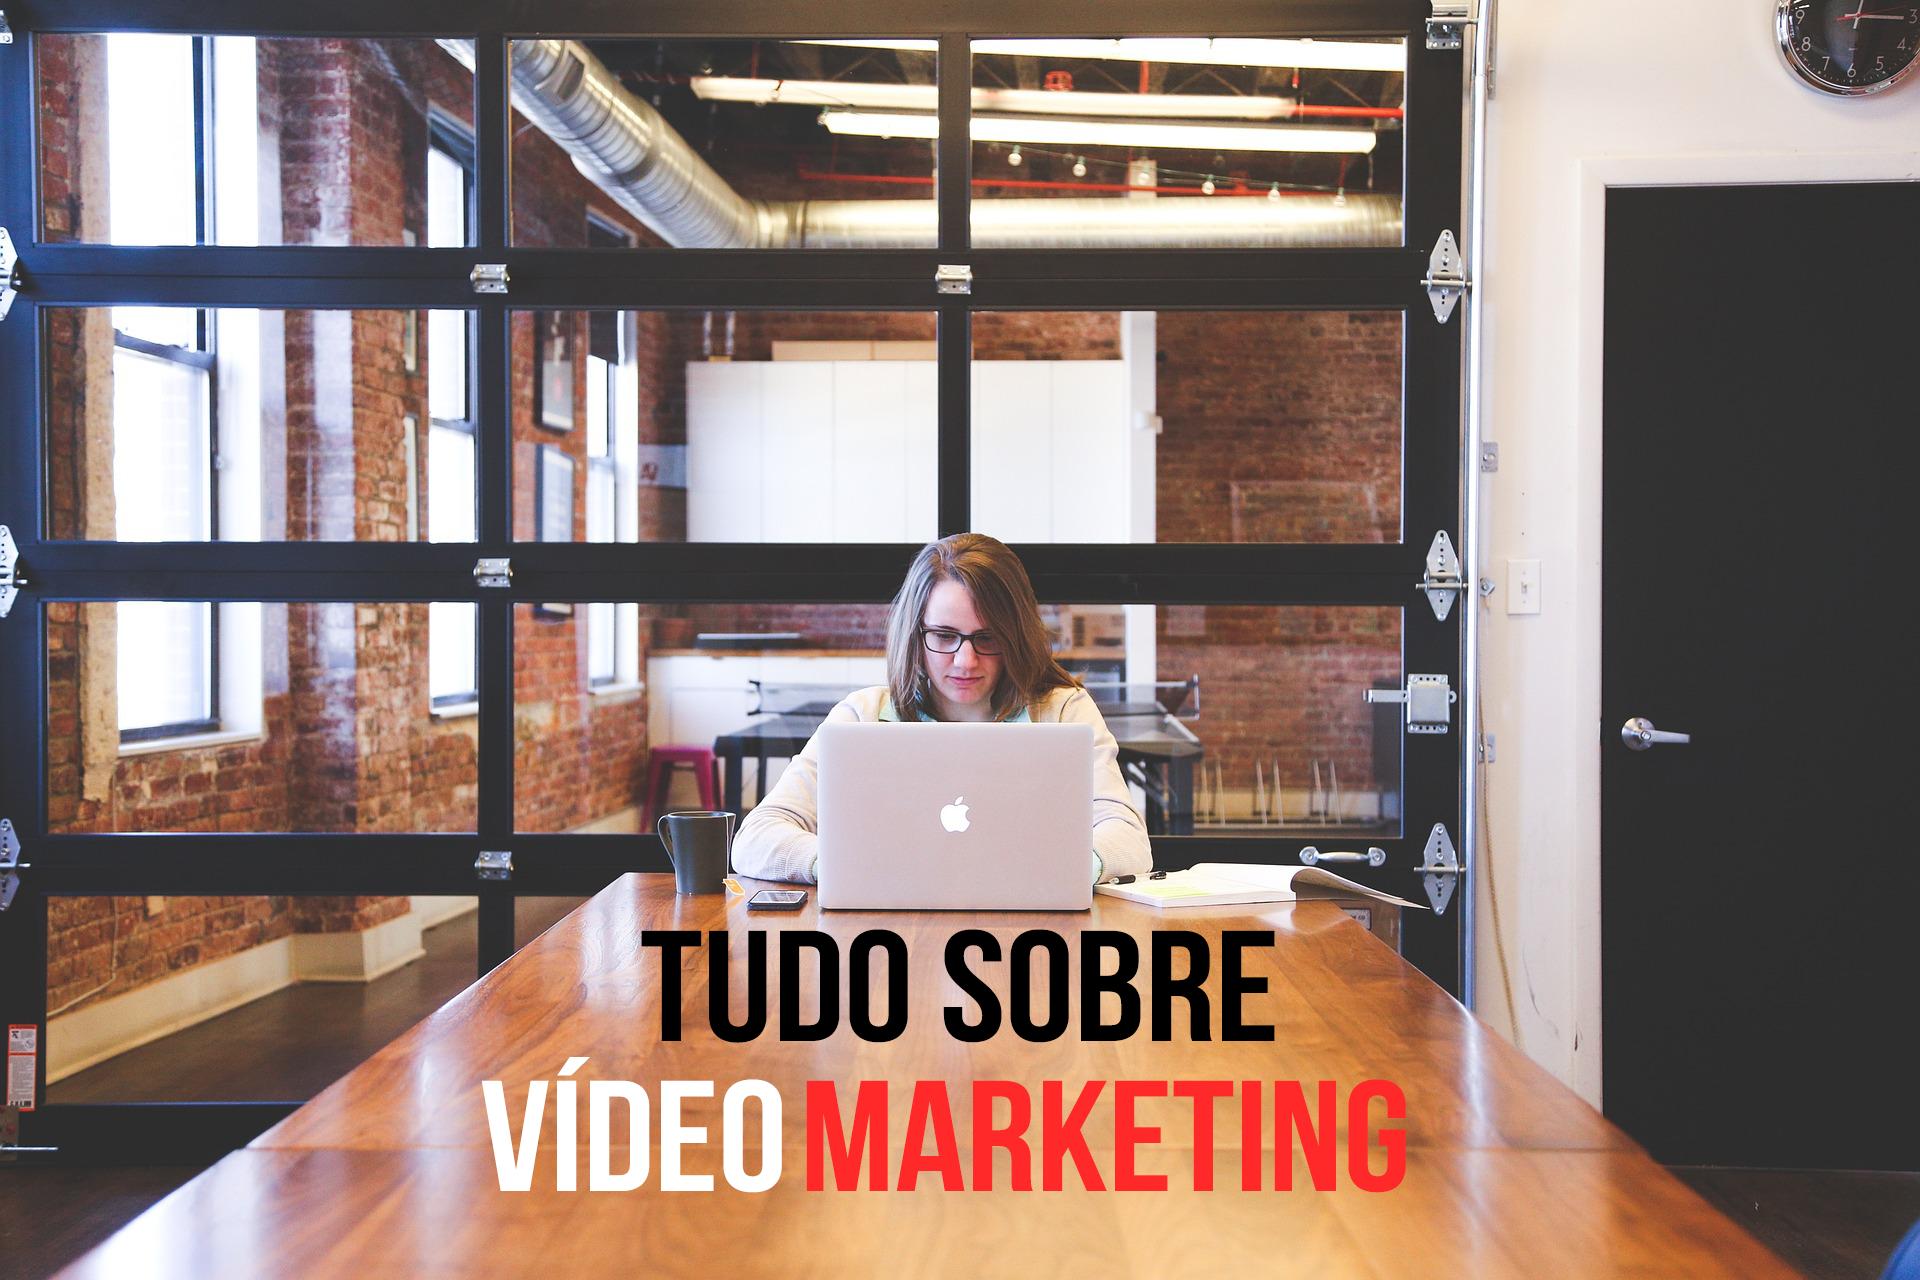 Tudo sobre Vídeo Marketing